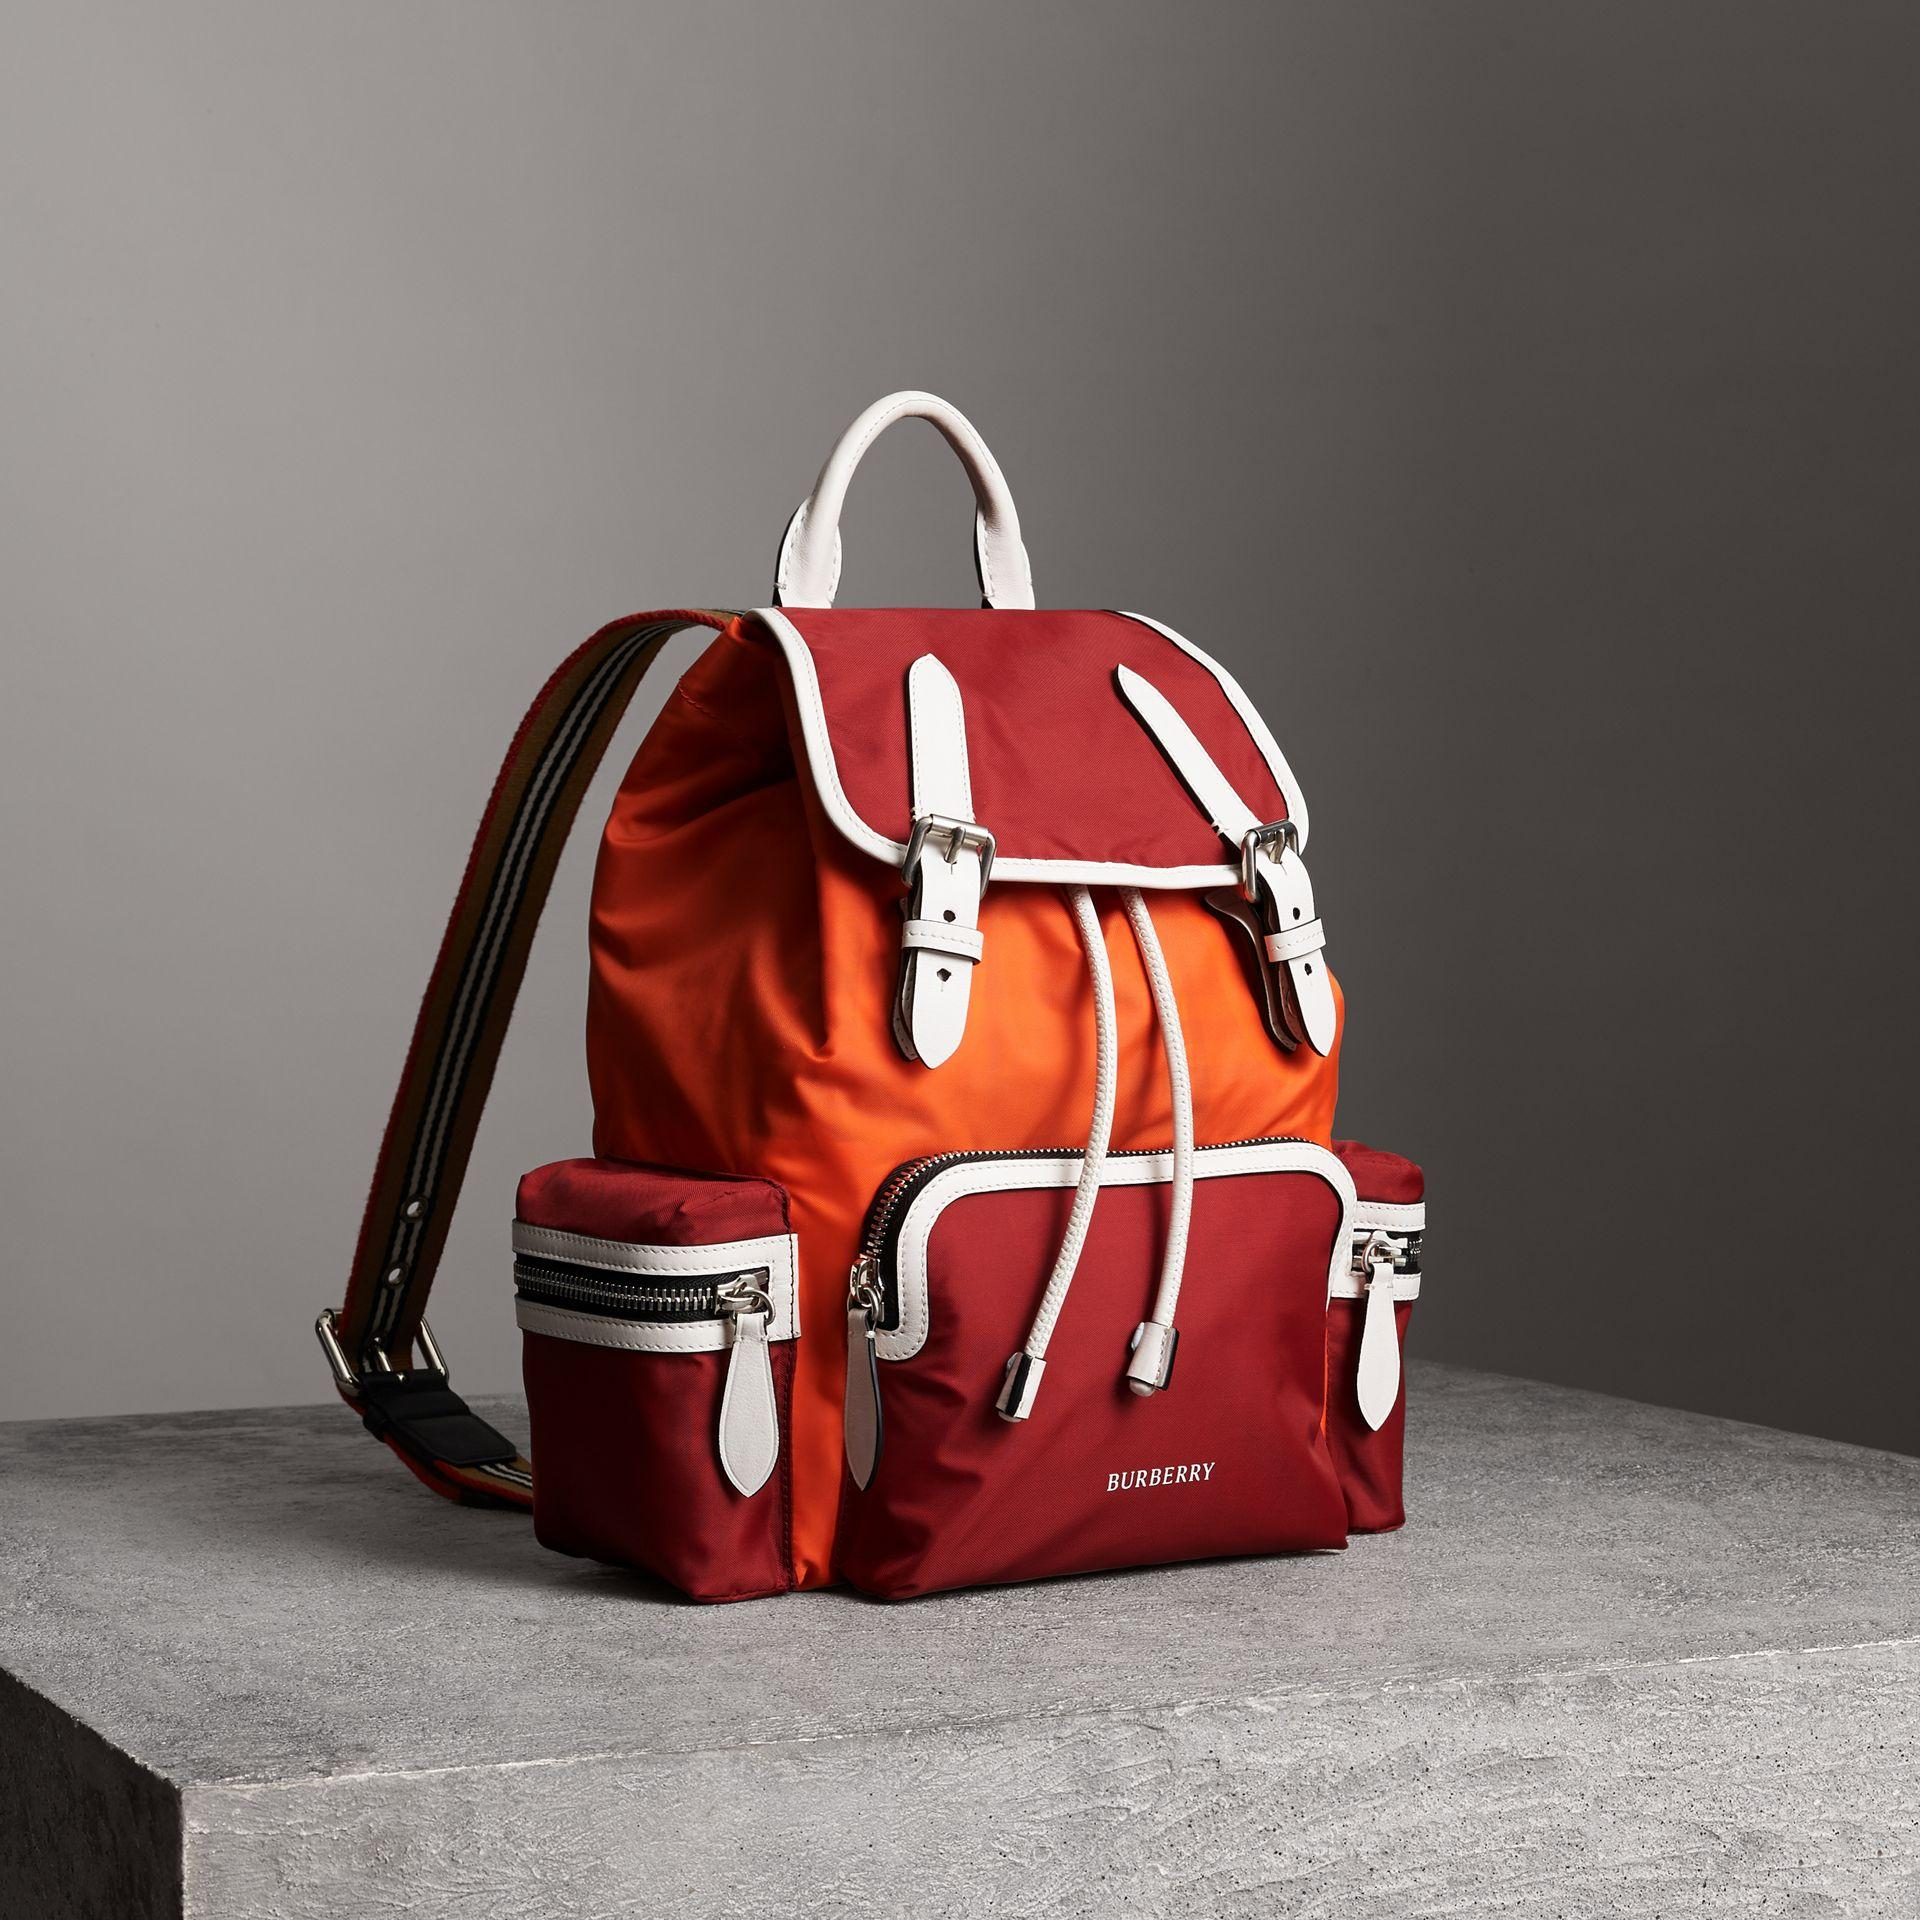 641a4016a7e Burberry The Medium Rucksack In Colour Block Nylon In Red | ModeSens